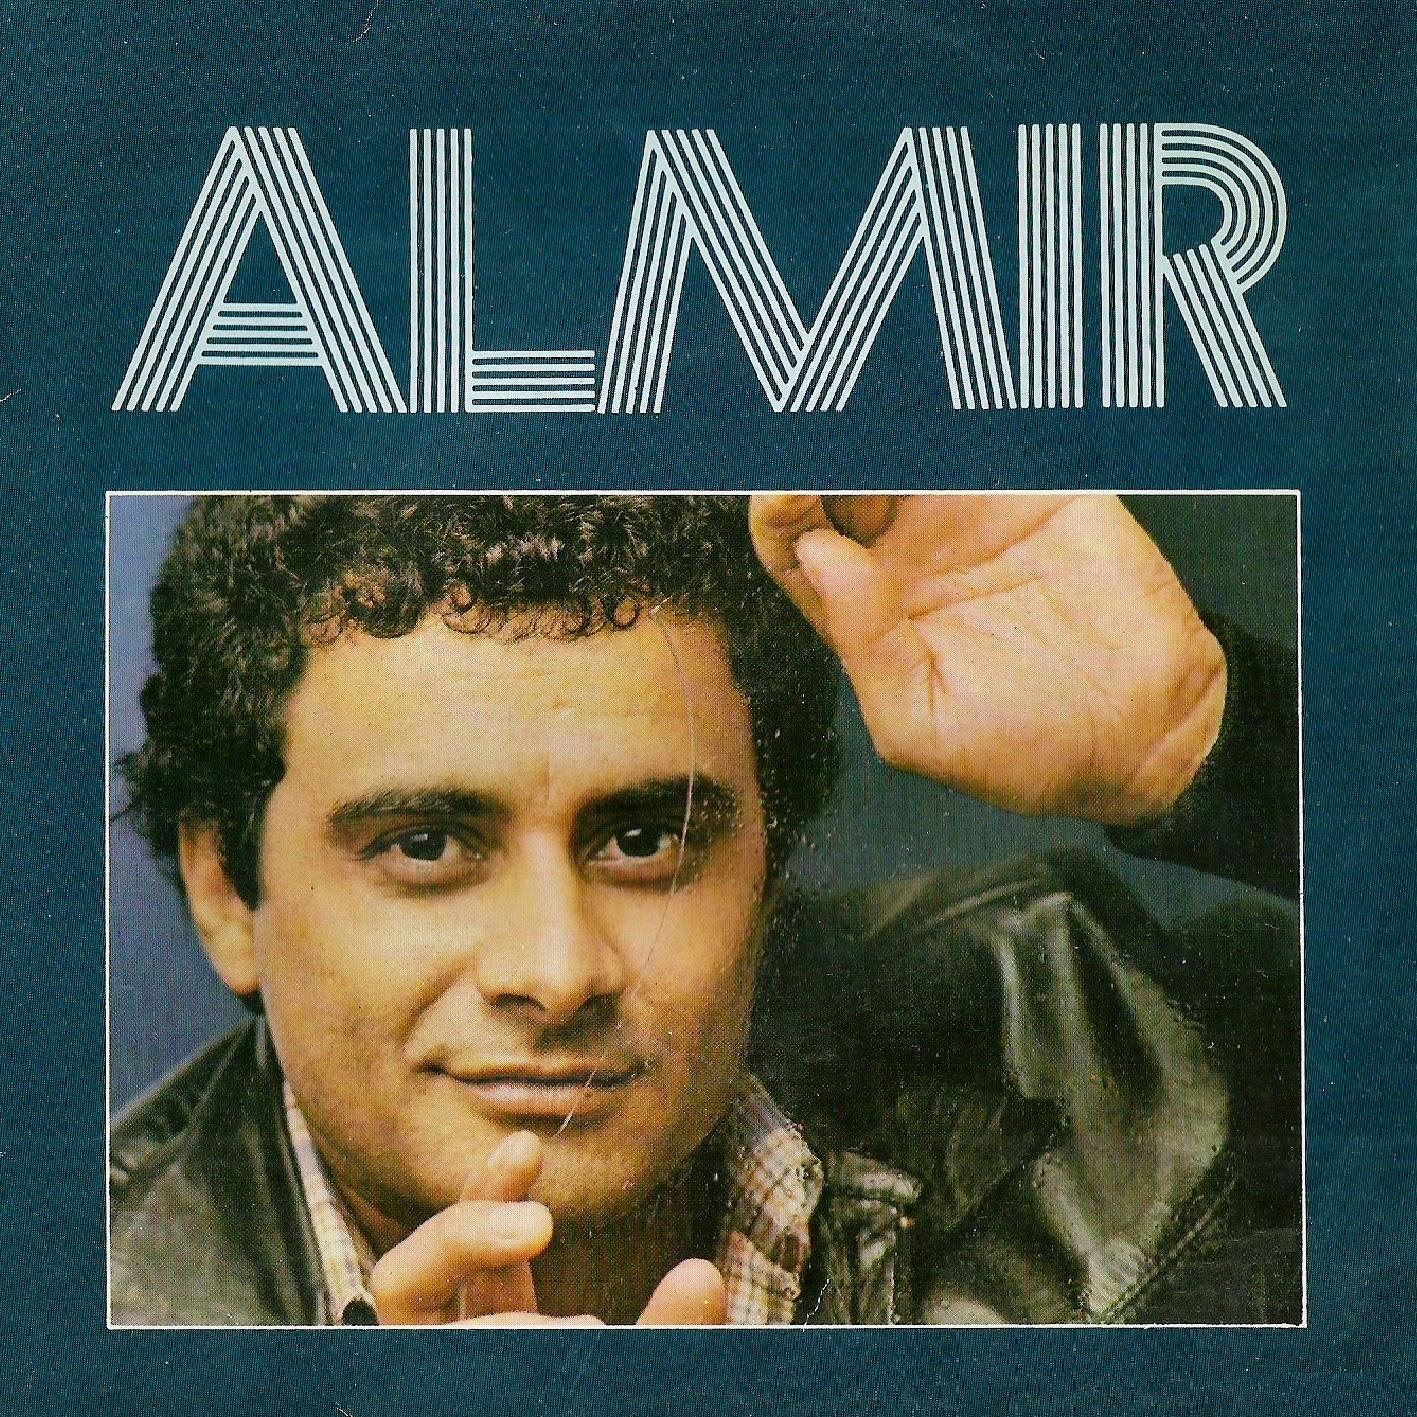 almir bezerra 1981